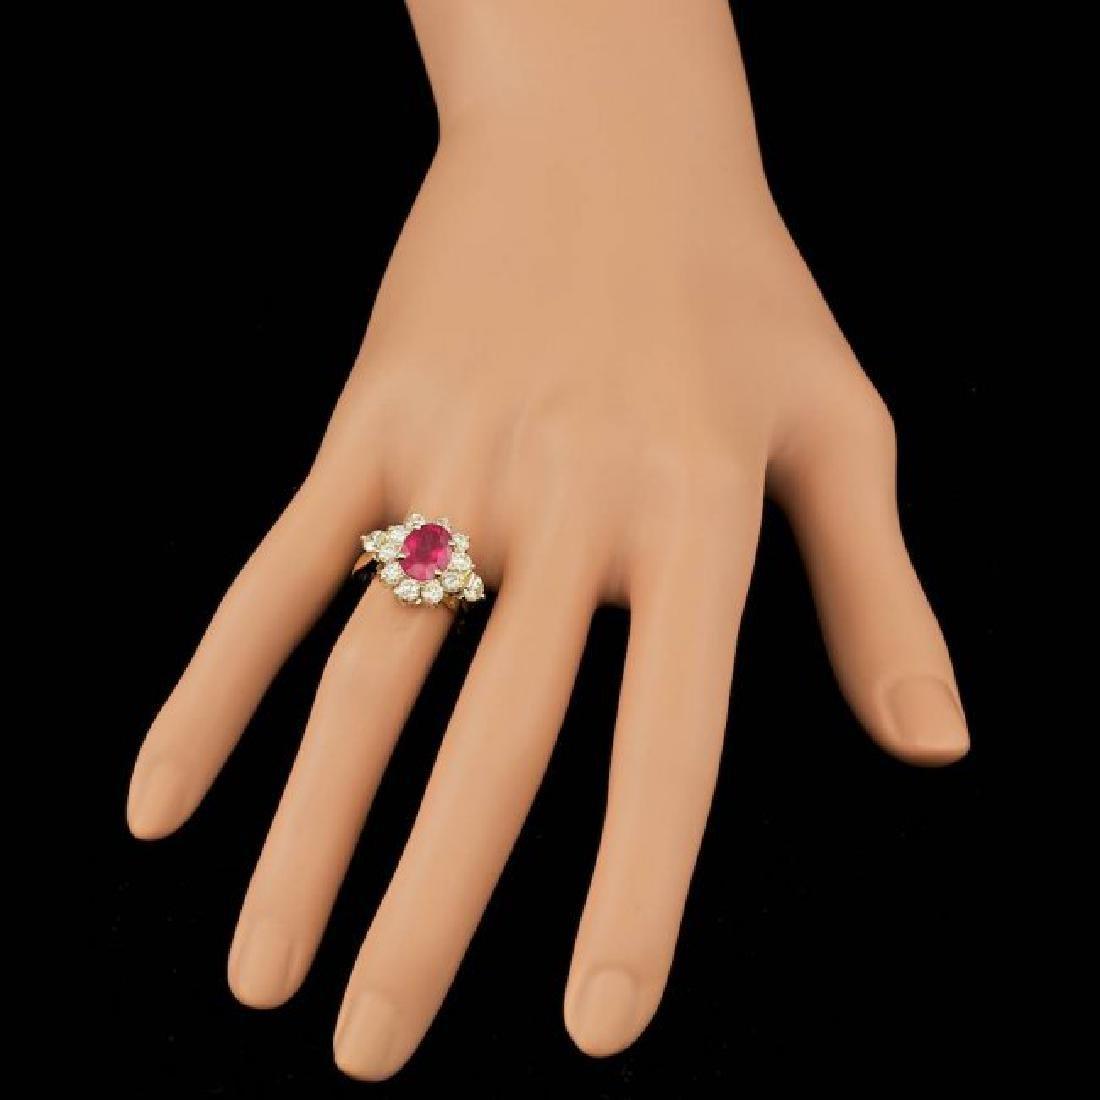 14k Yellow Gold 2.50ct Ruby 1.50ct Diamond Ring - 4